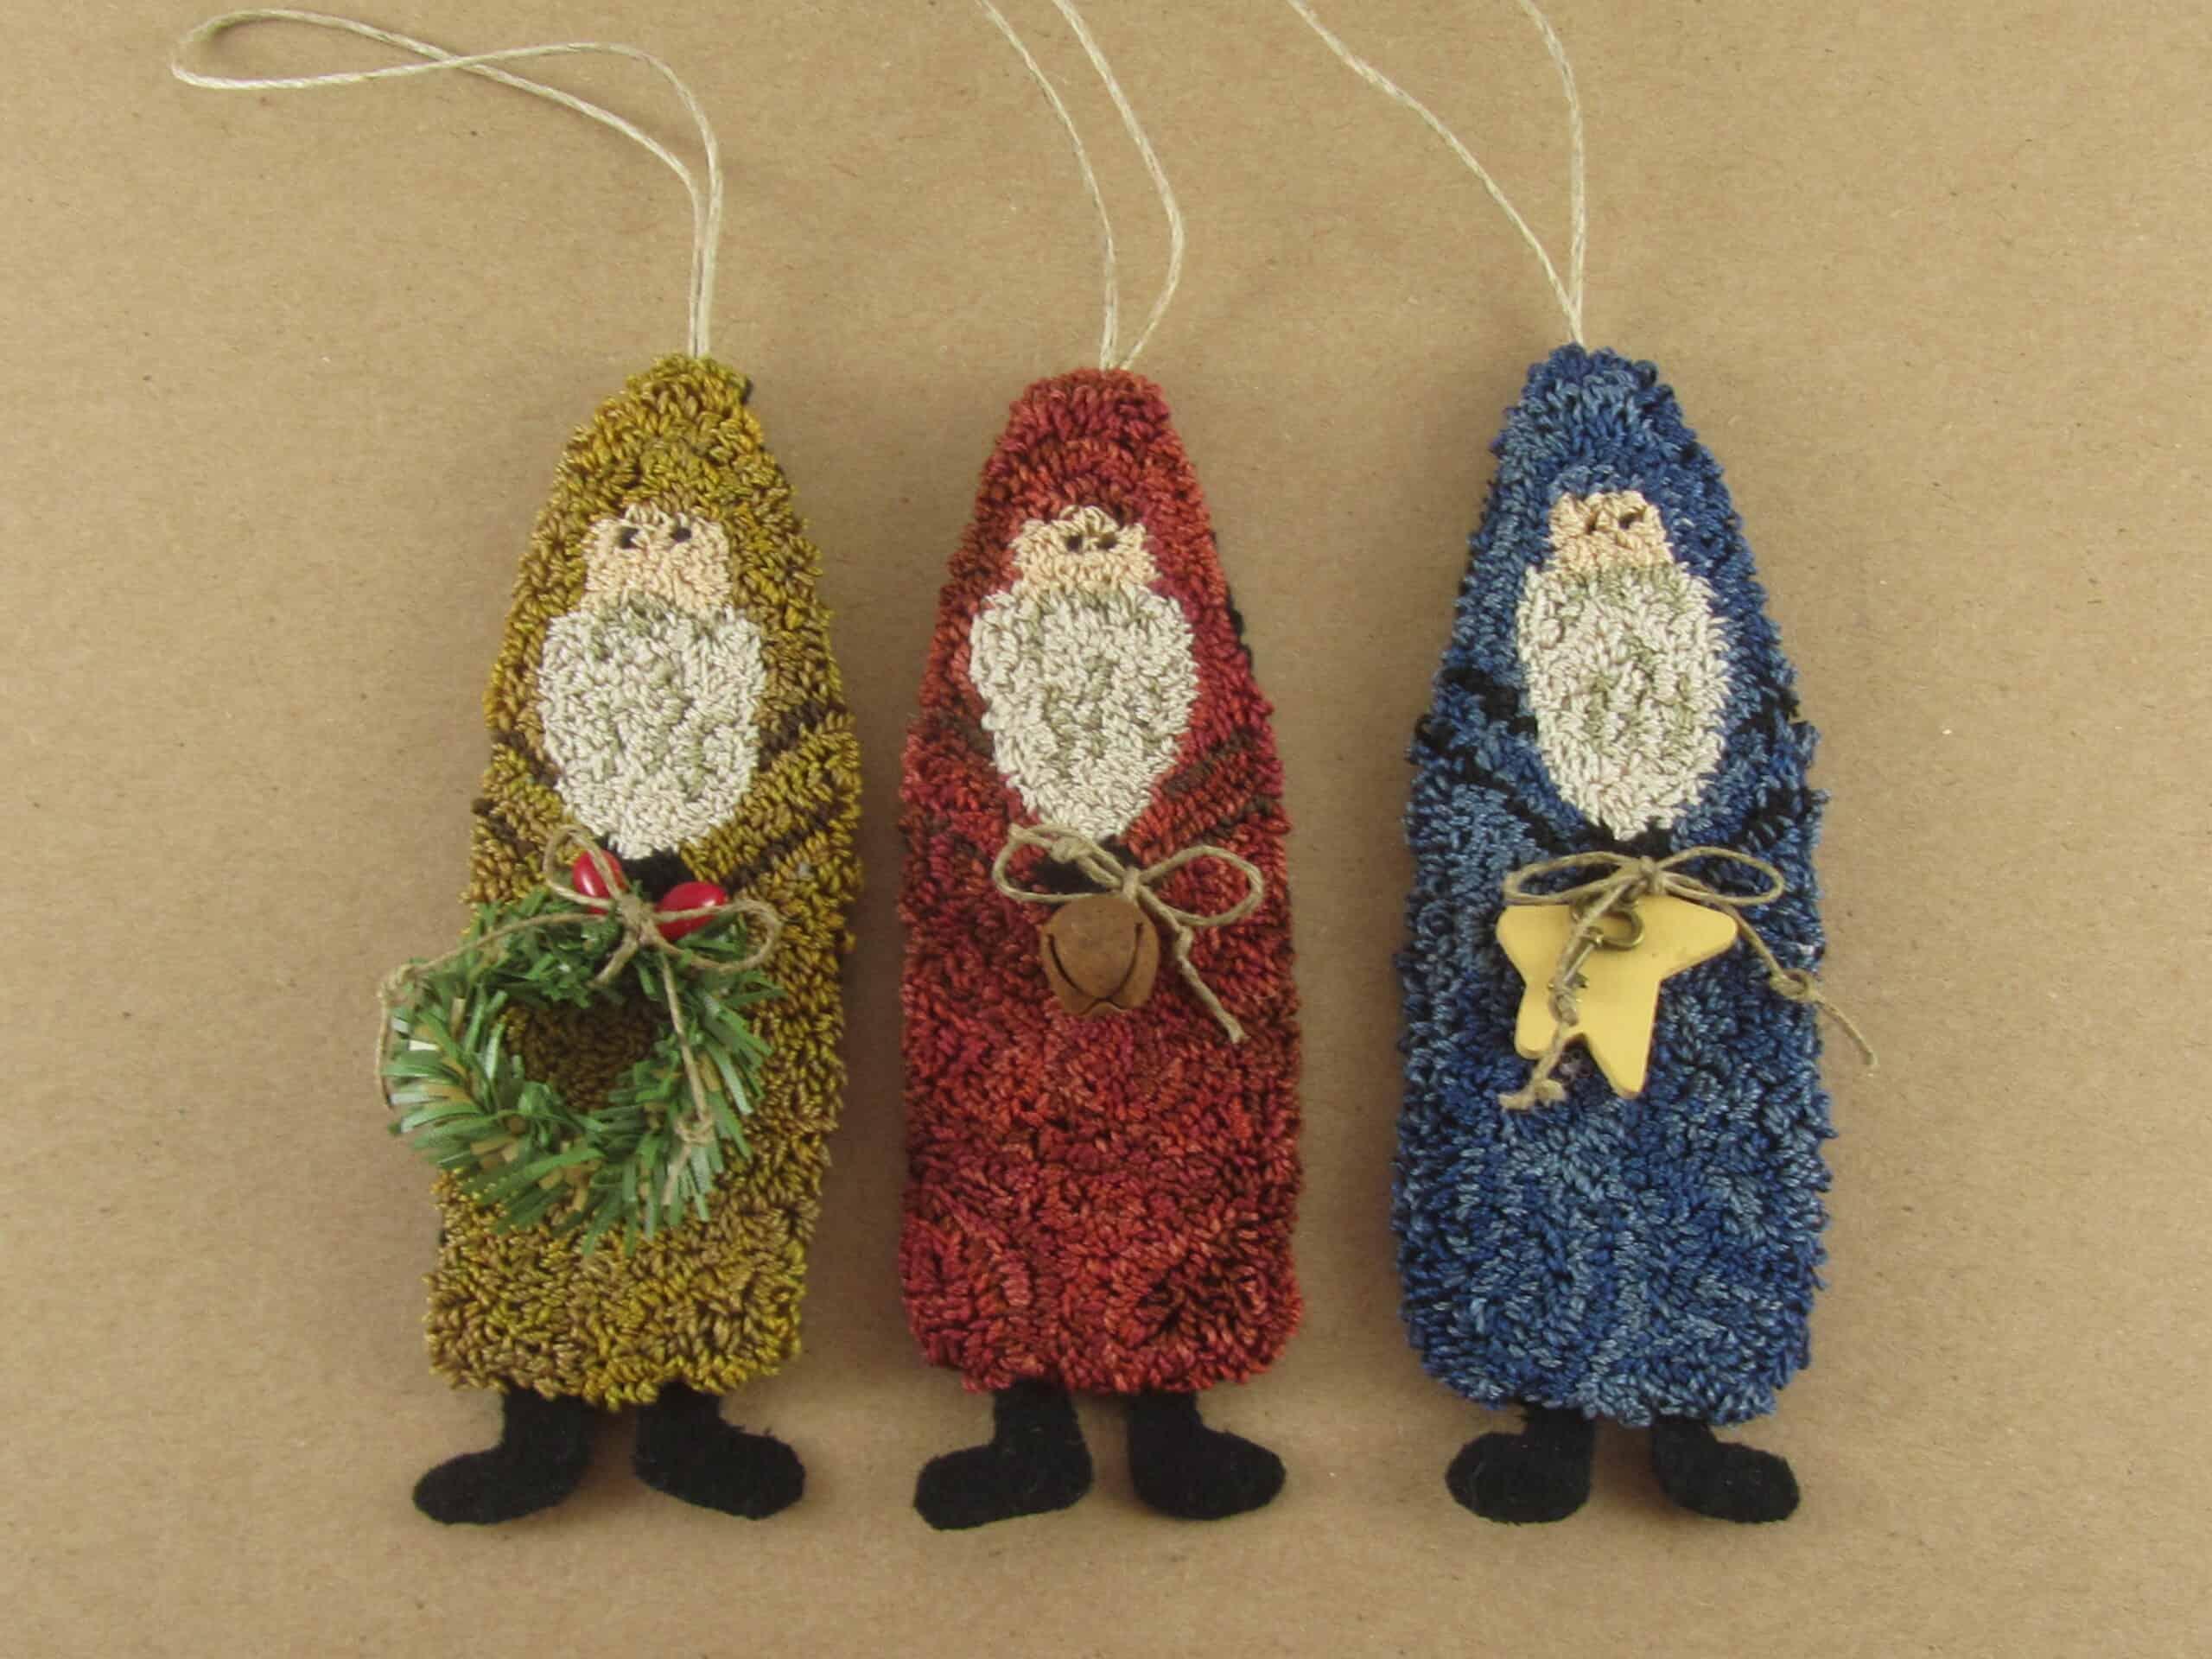 Primitive Santa Christmas ornaments